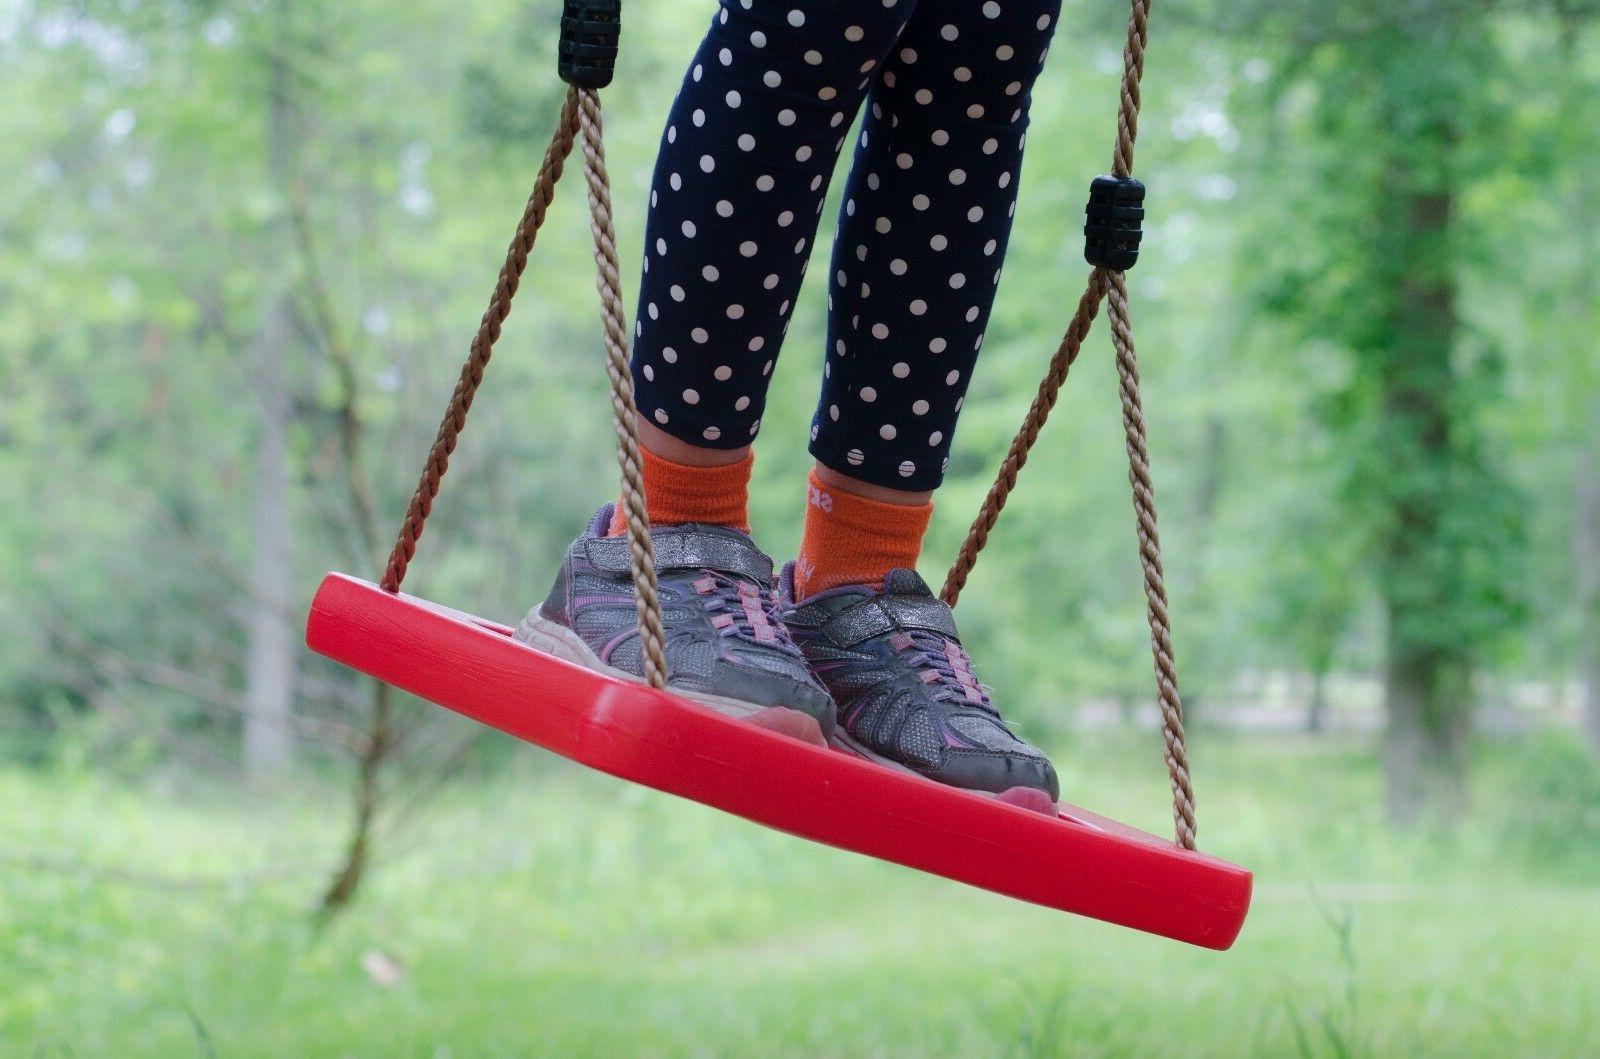 Swingset Up Swing